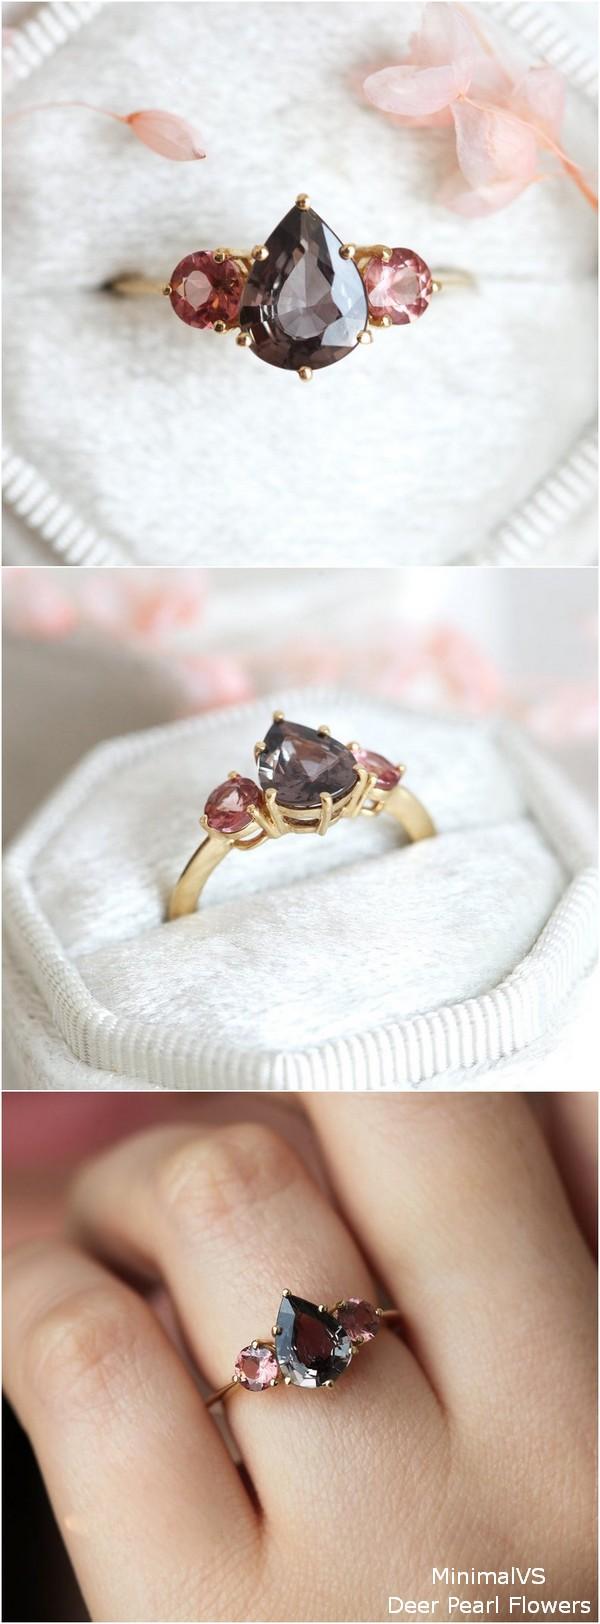 Burgundy Sapphire Engagement Ring with Malaya Garnet